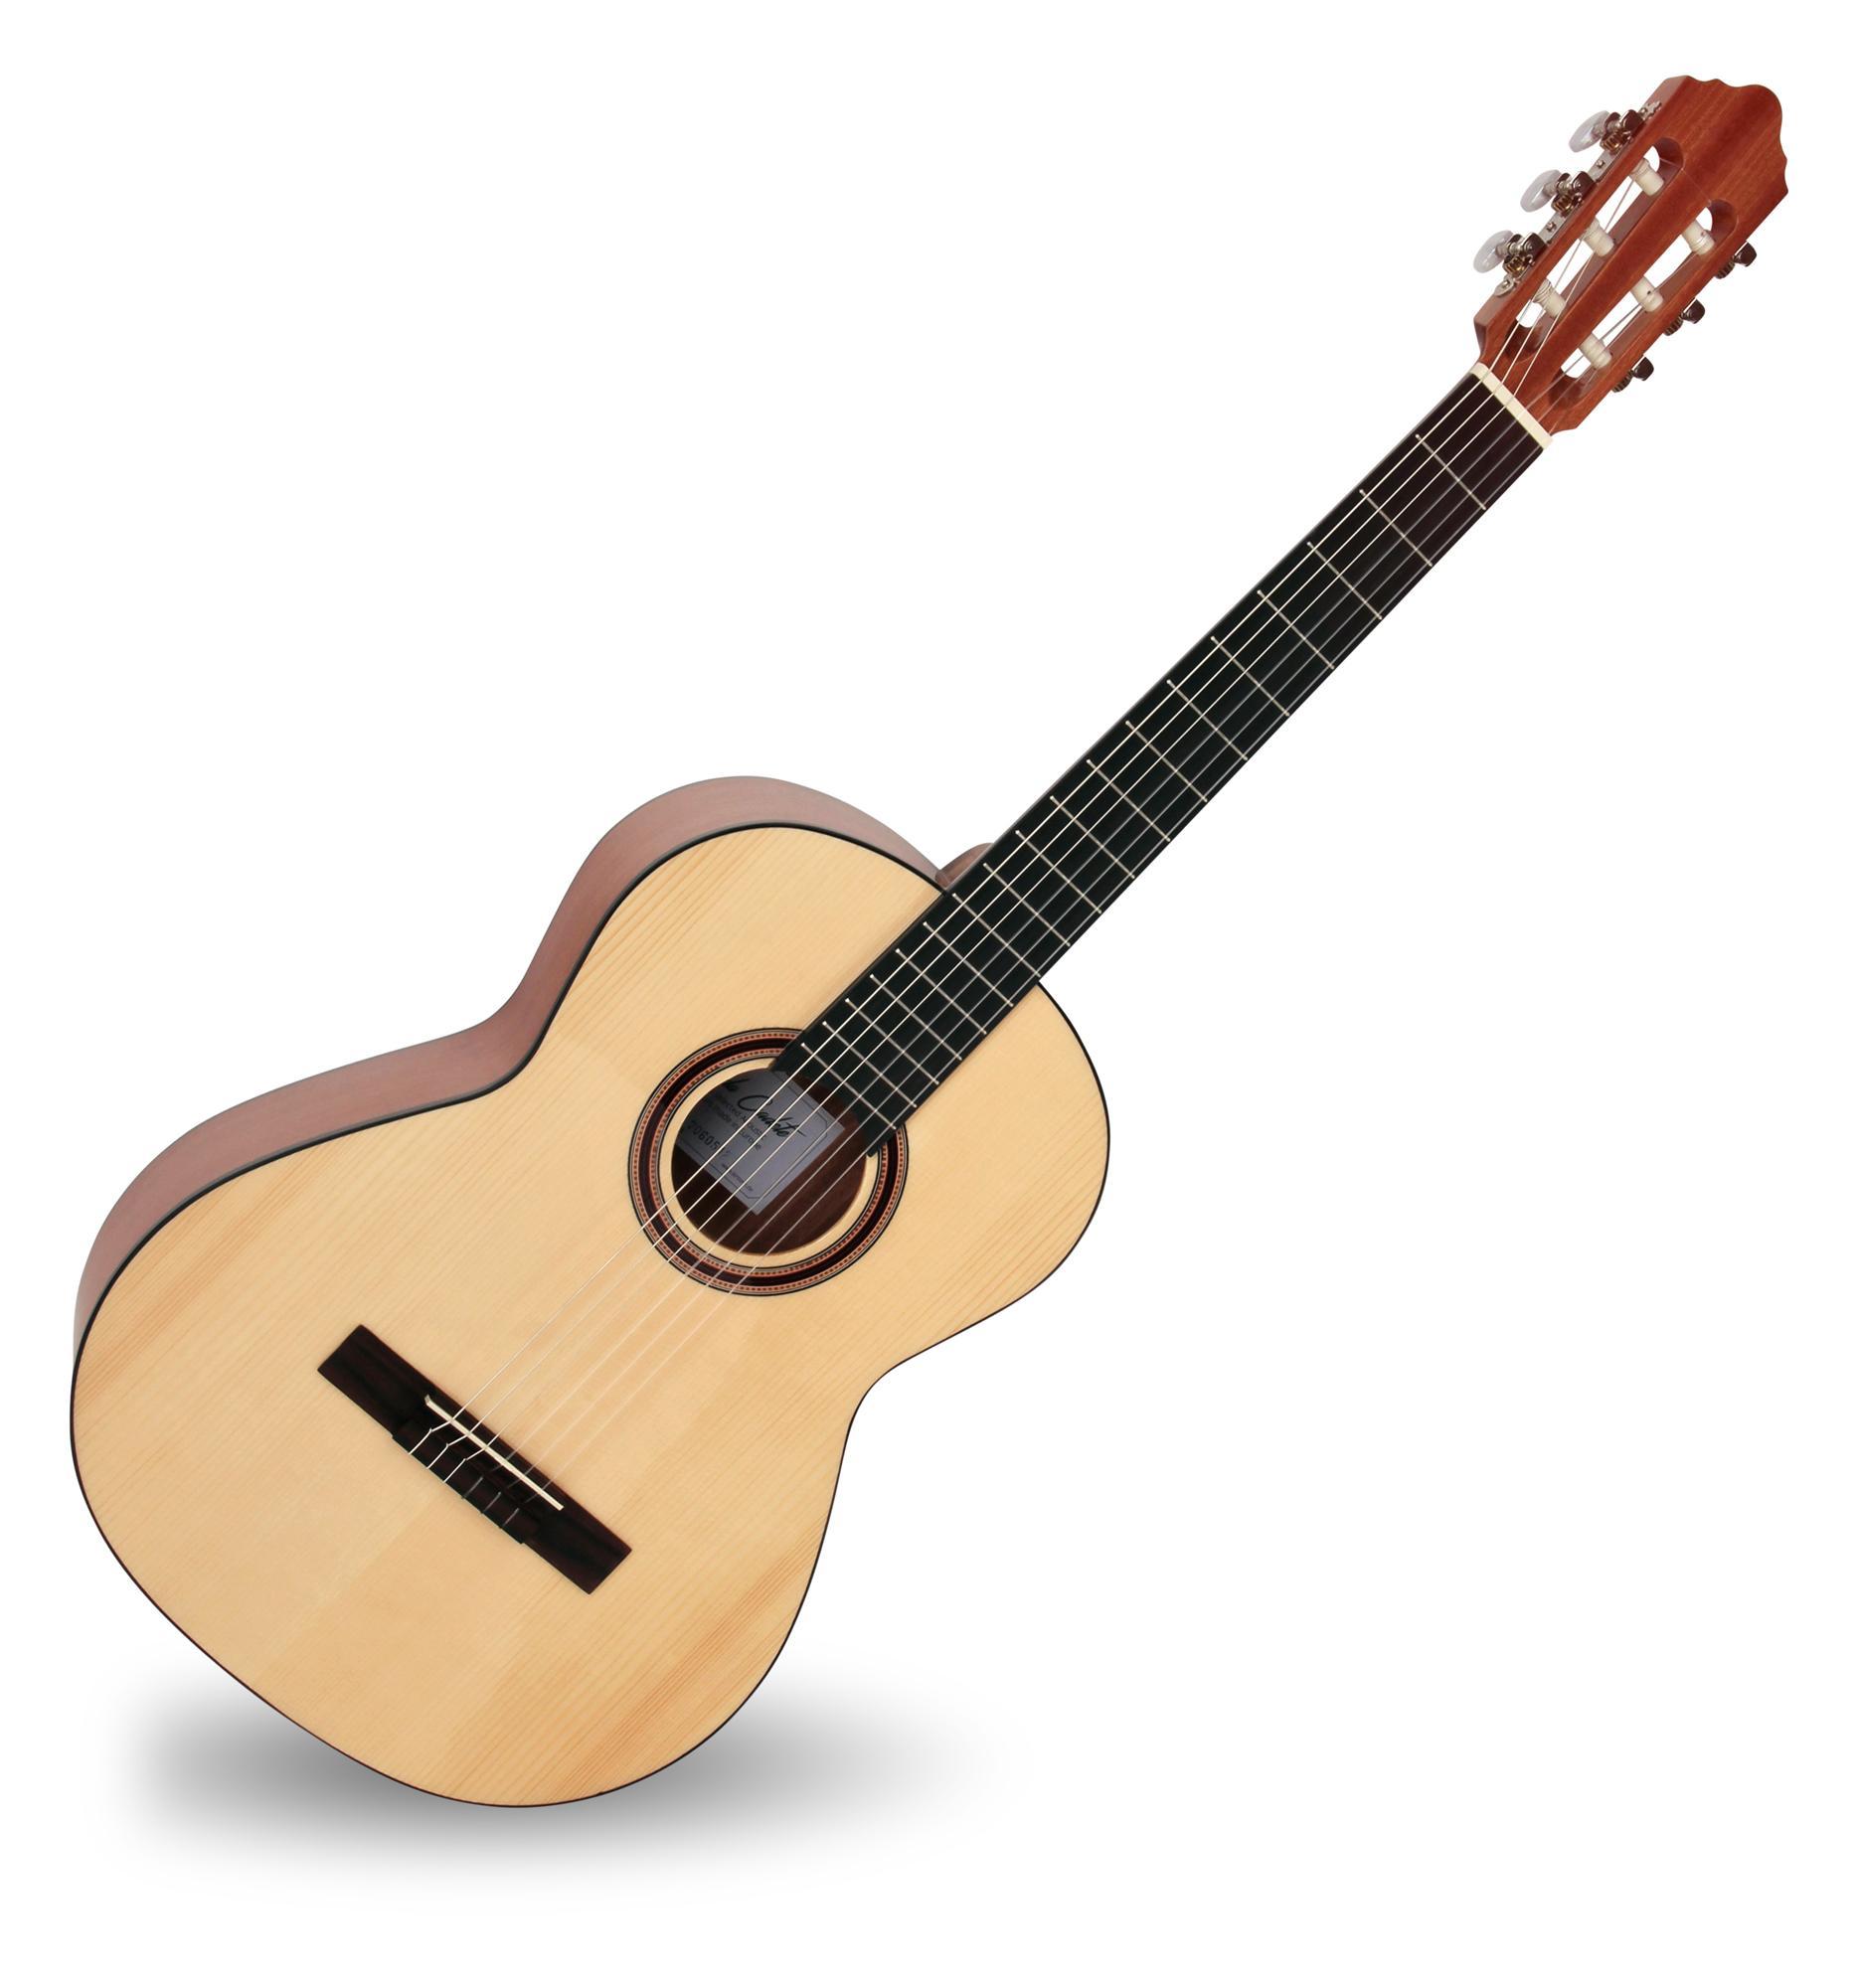 Calida Cadete Konzertgitarre 7 8 Fichte Hochglanz Made in Portugal